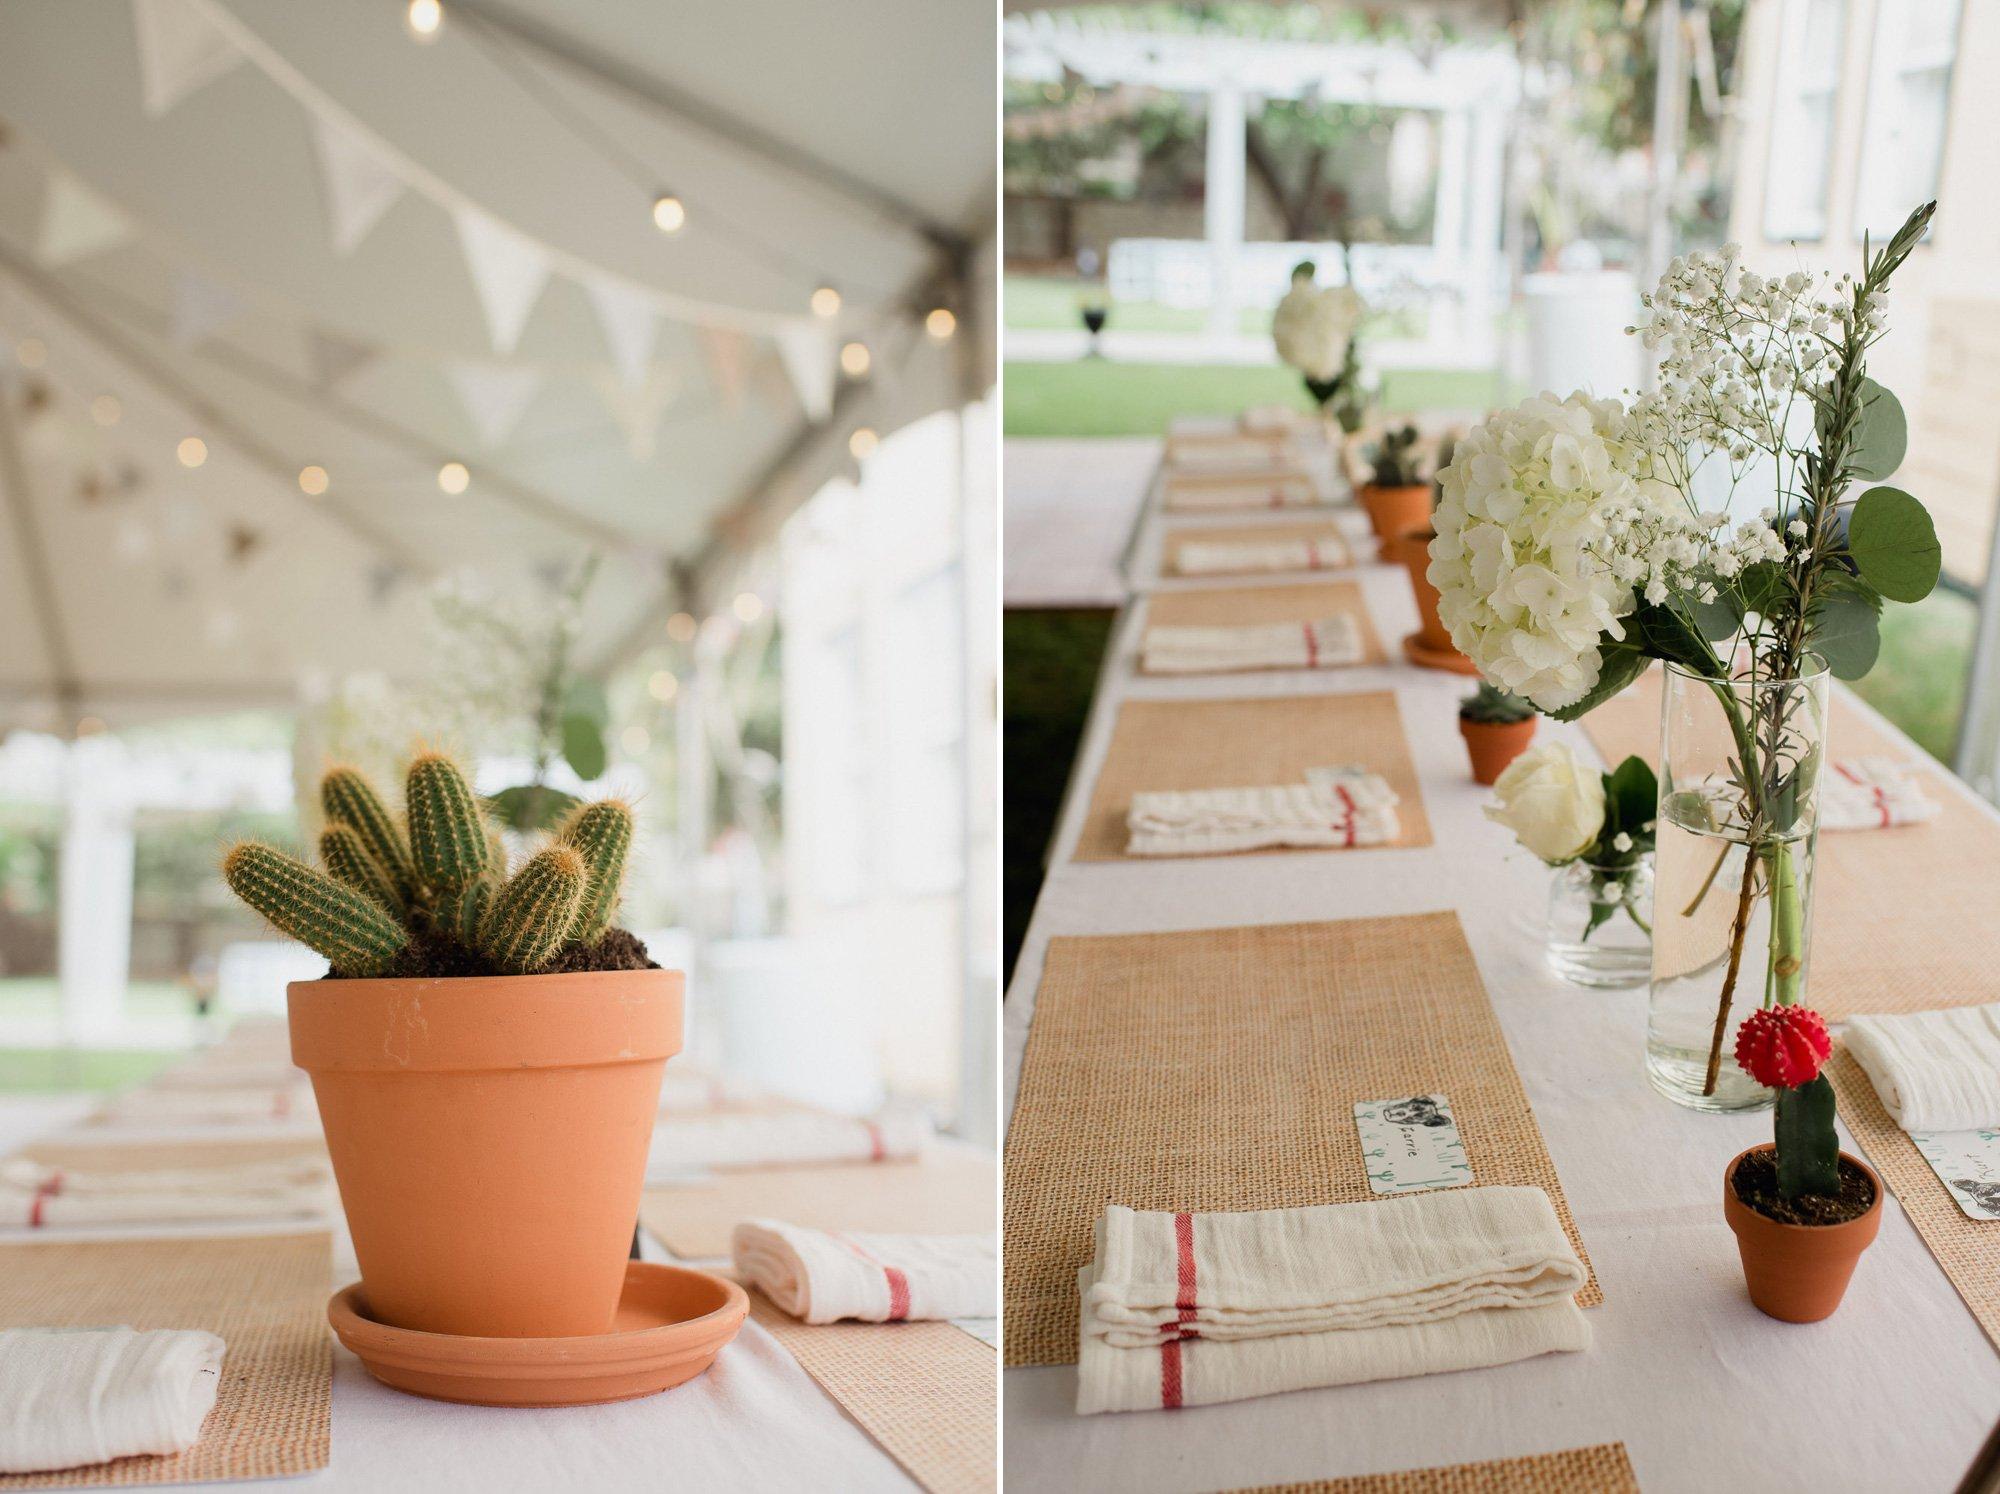 organic, cactus san antonio backyard wedding details